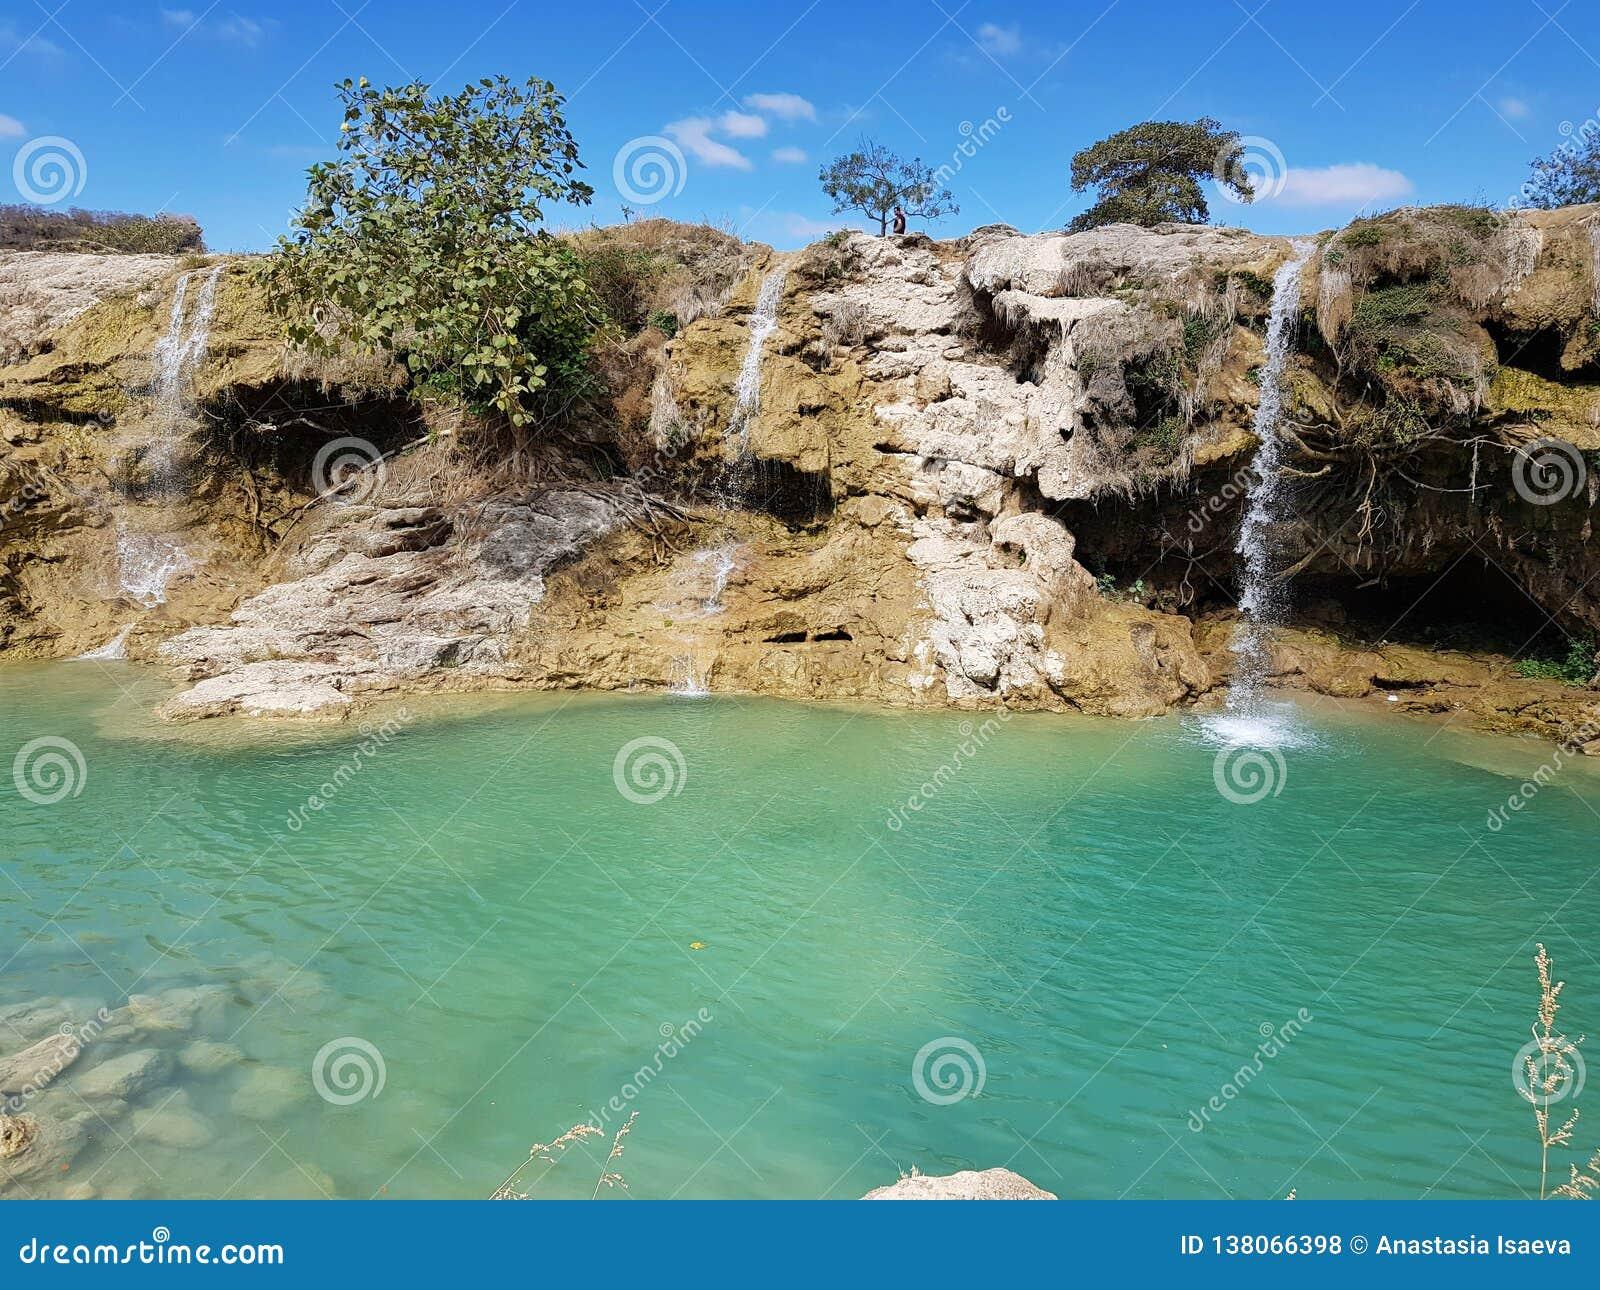 Cascate tropicali con acqua blu